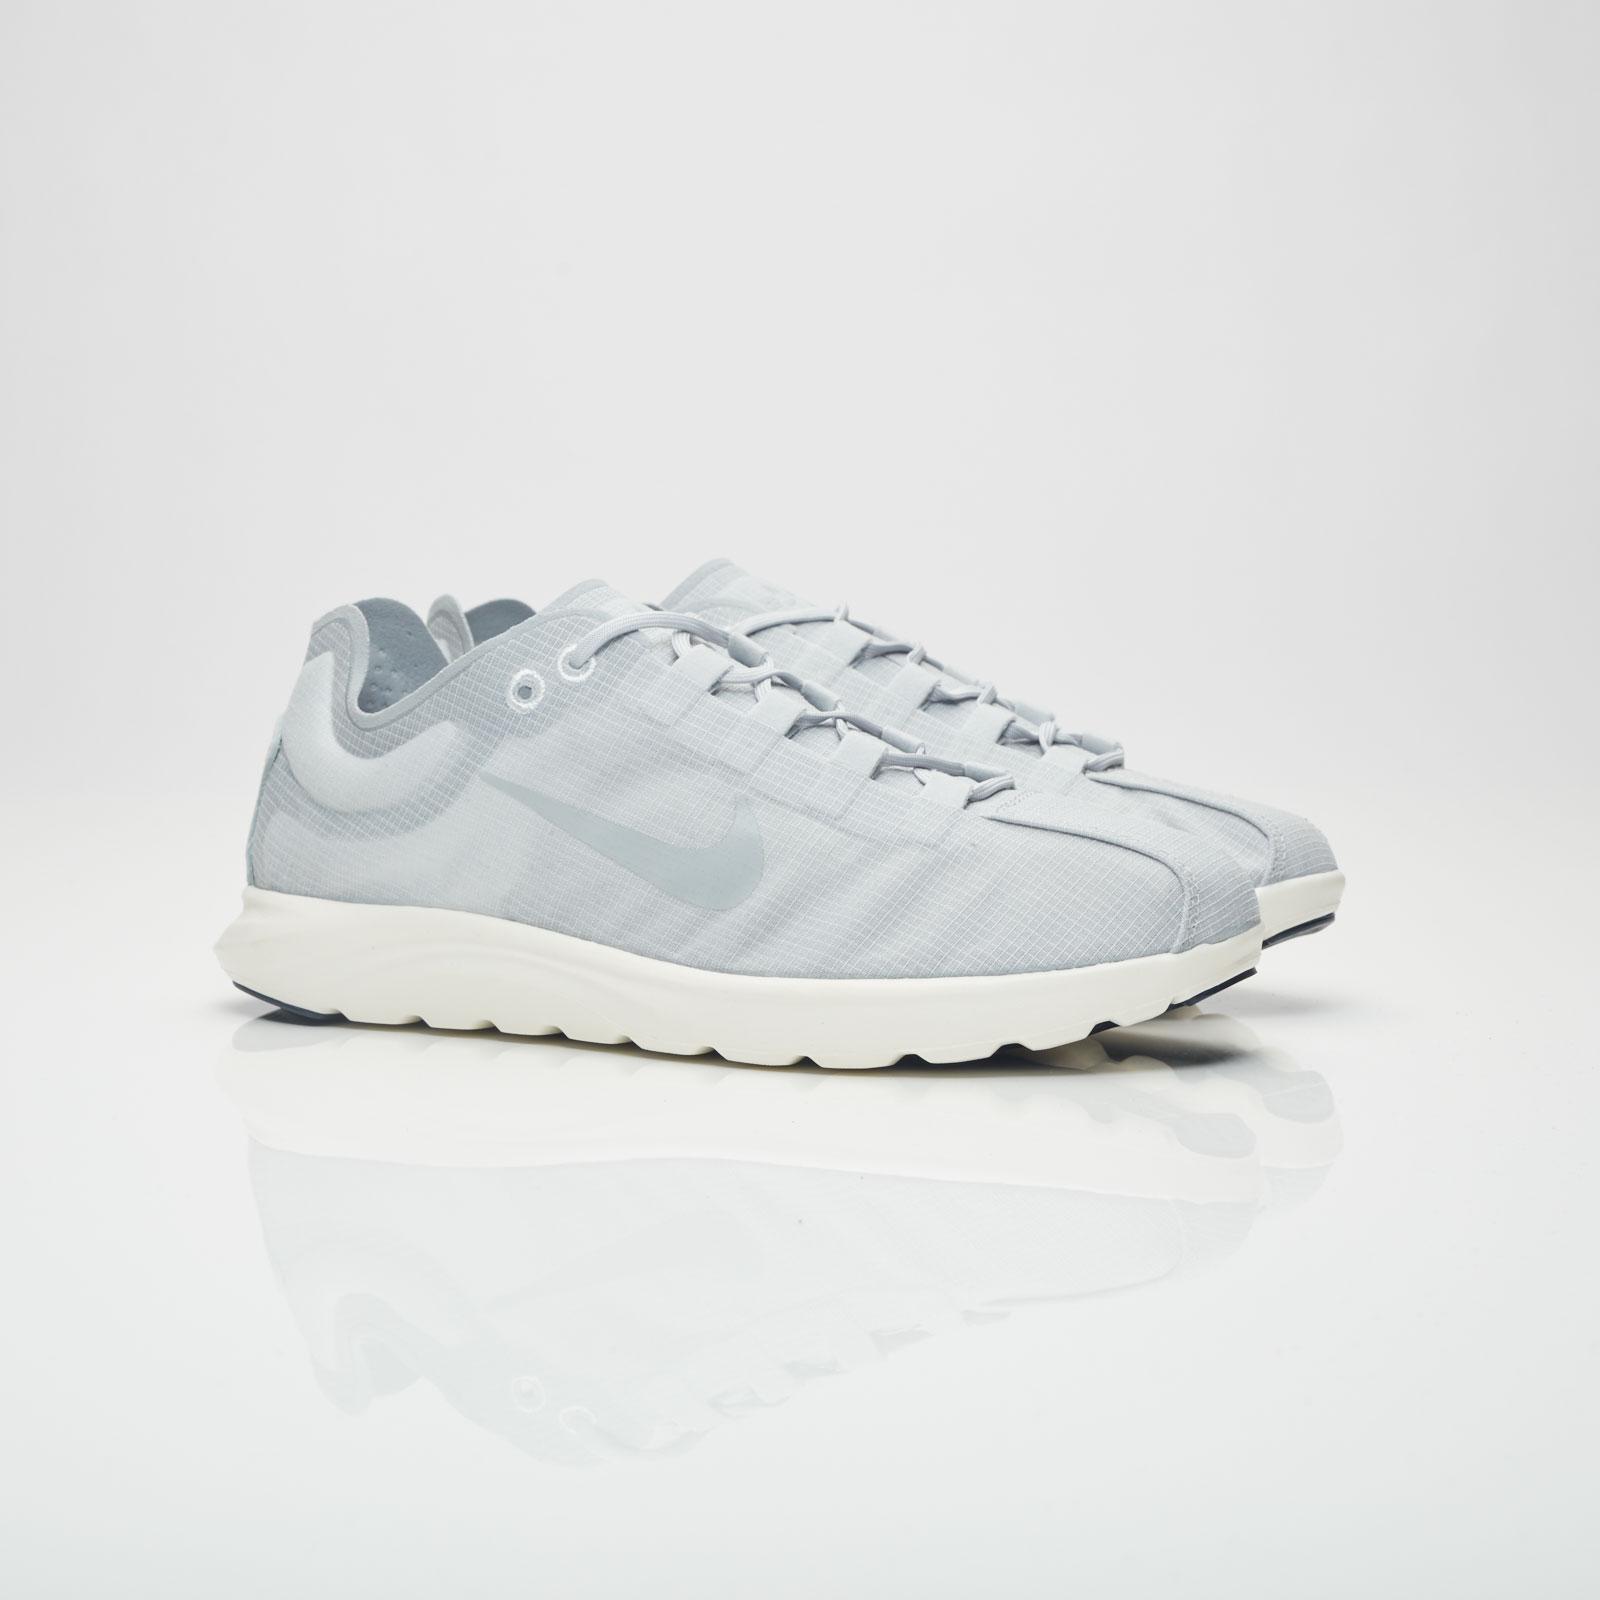 save off 8a9ca 4d5de Nike Sportswear Wmns Mayfly Lite Pinnacle